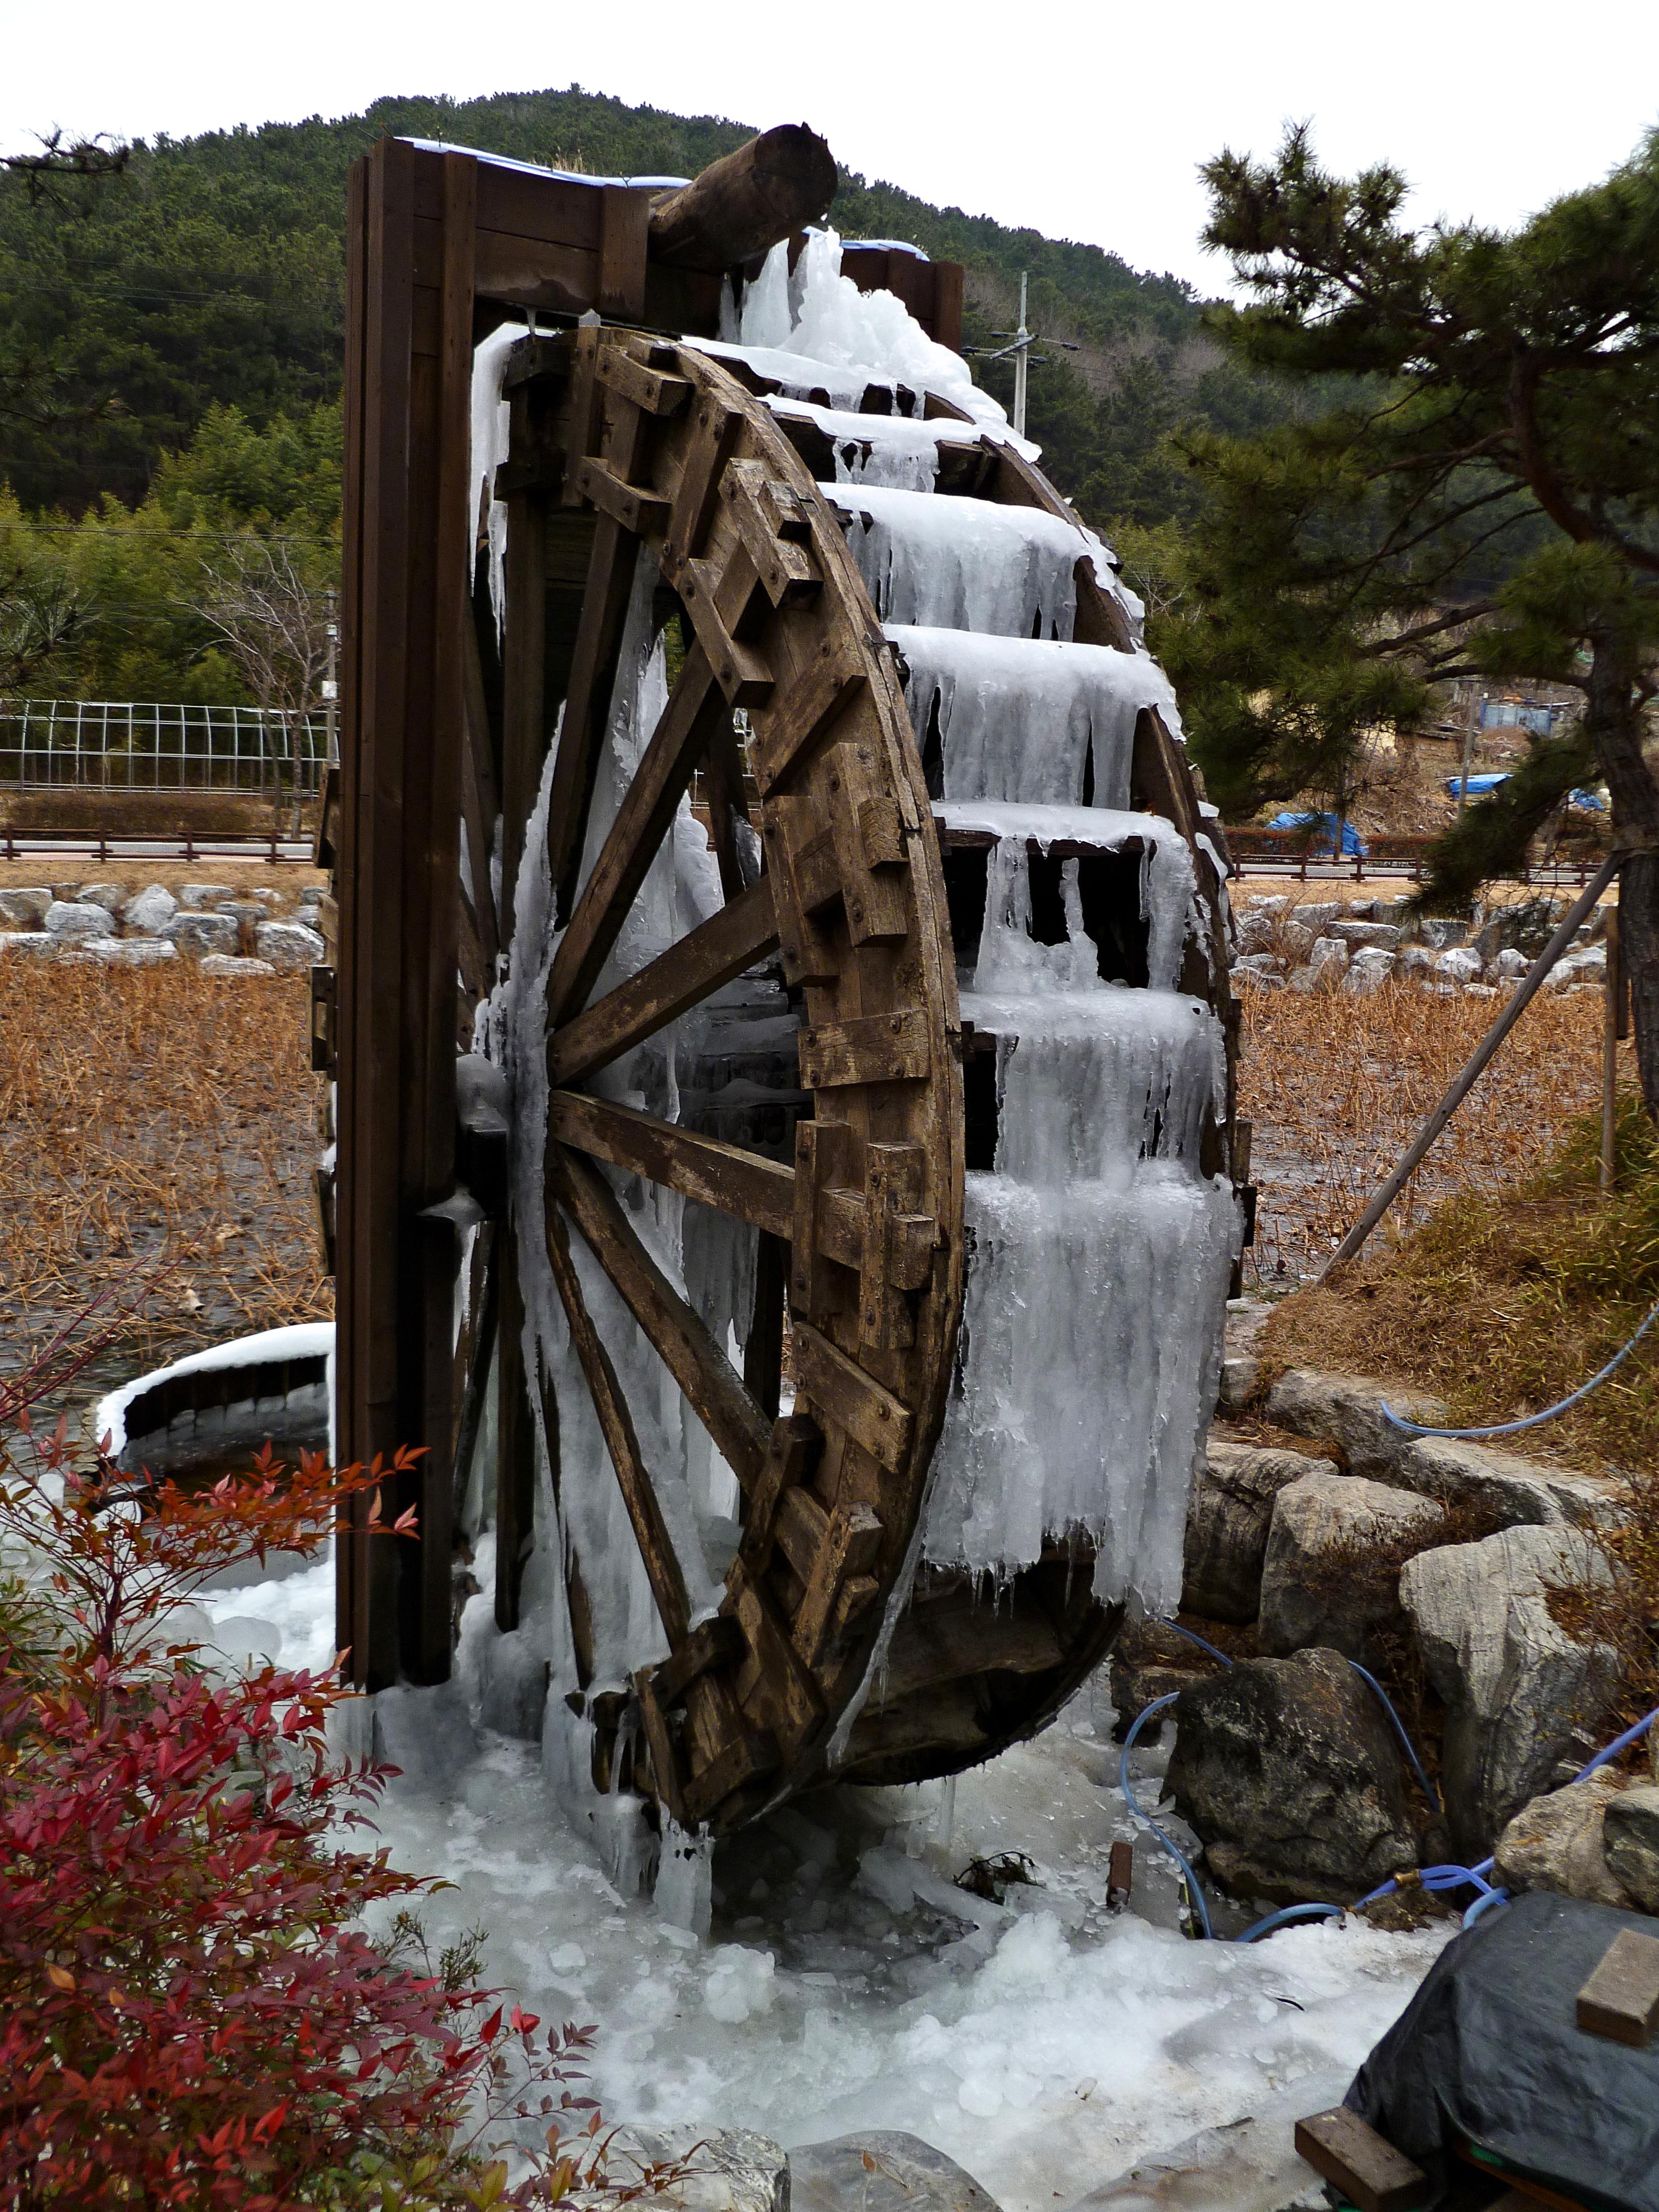 file frozen water wheel close up at seonam lake park ulsan jpg